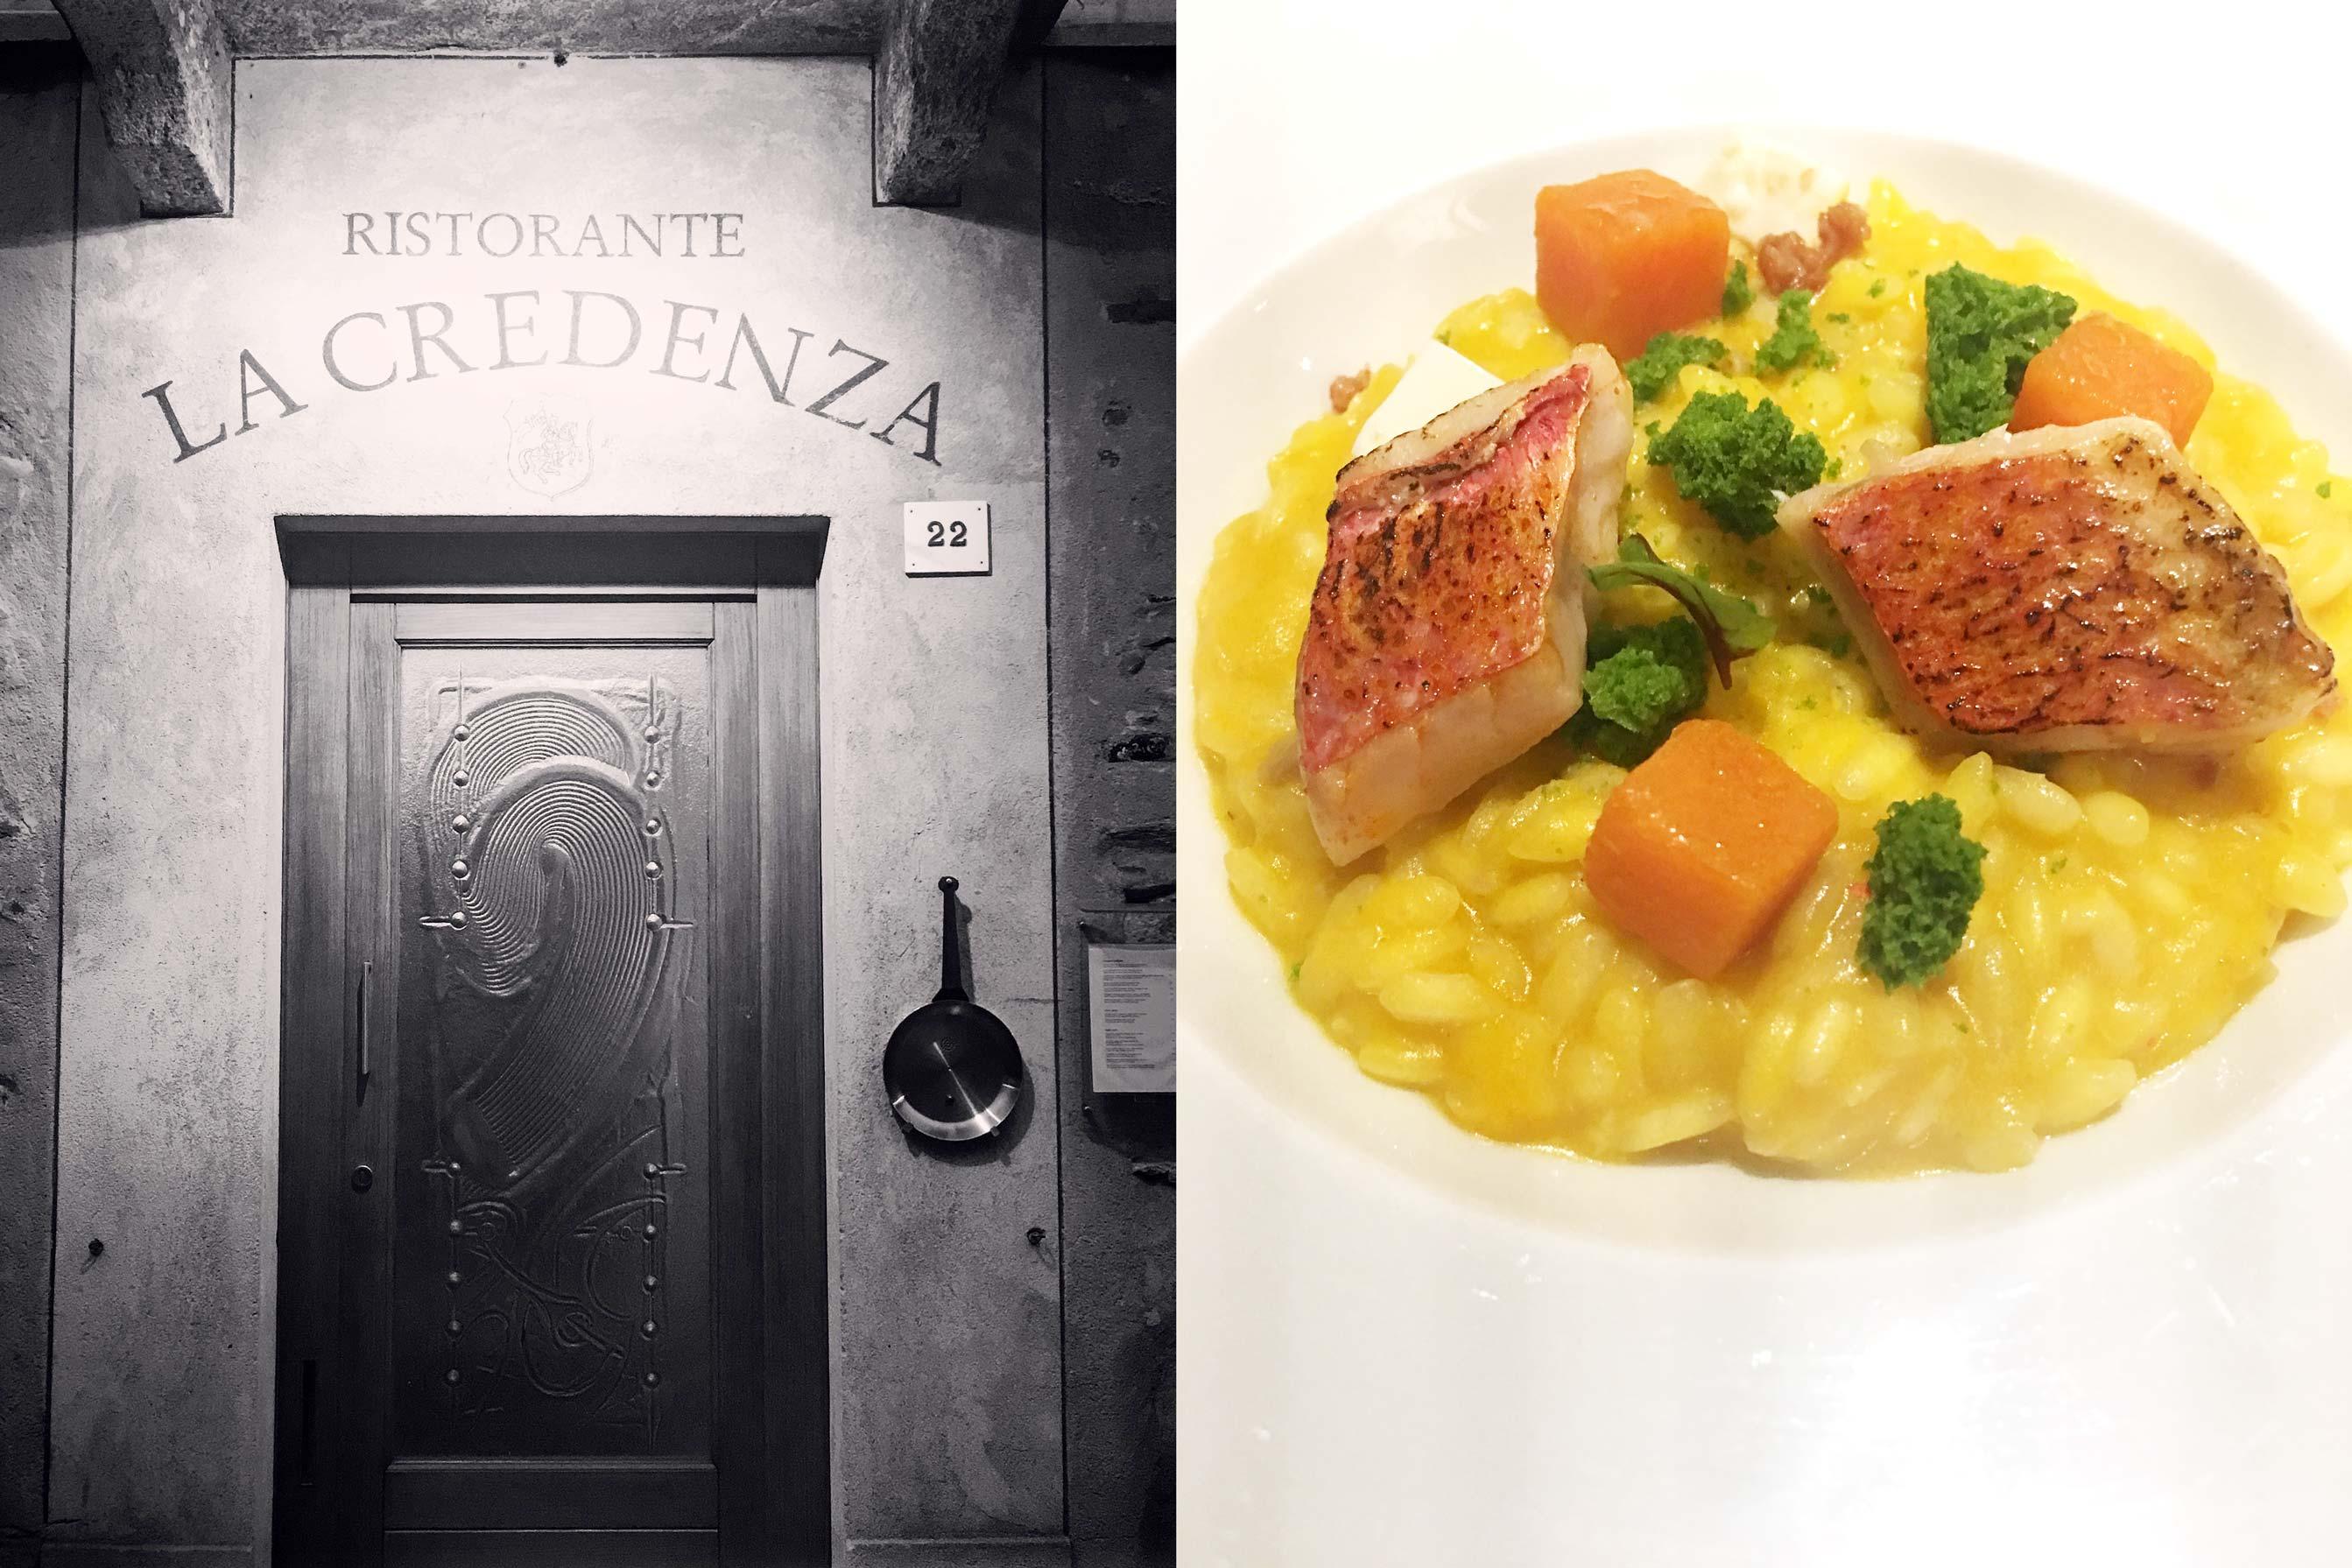 La Credenza in Turin Italy